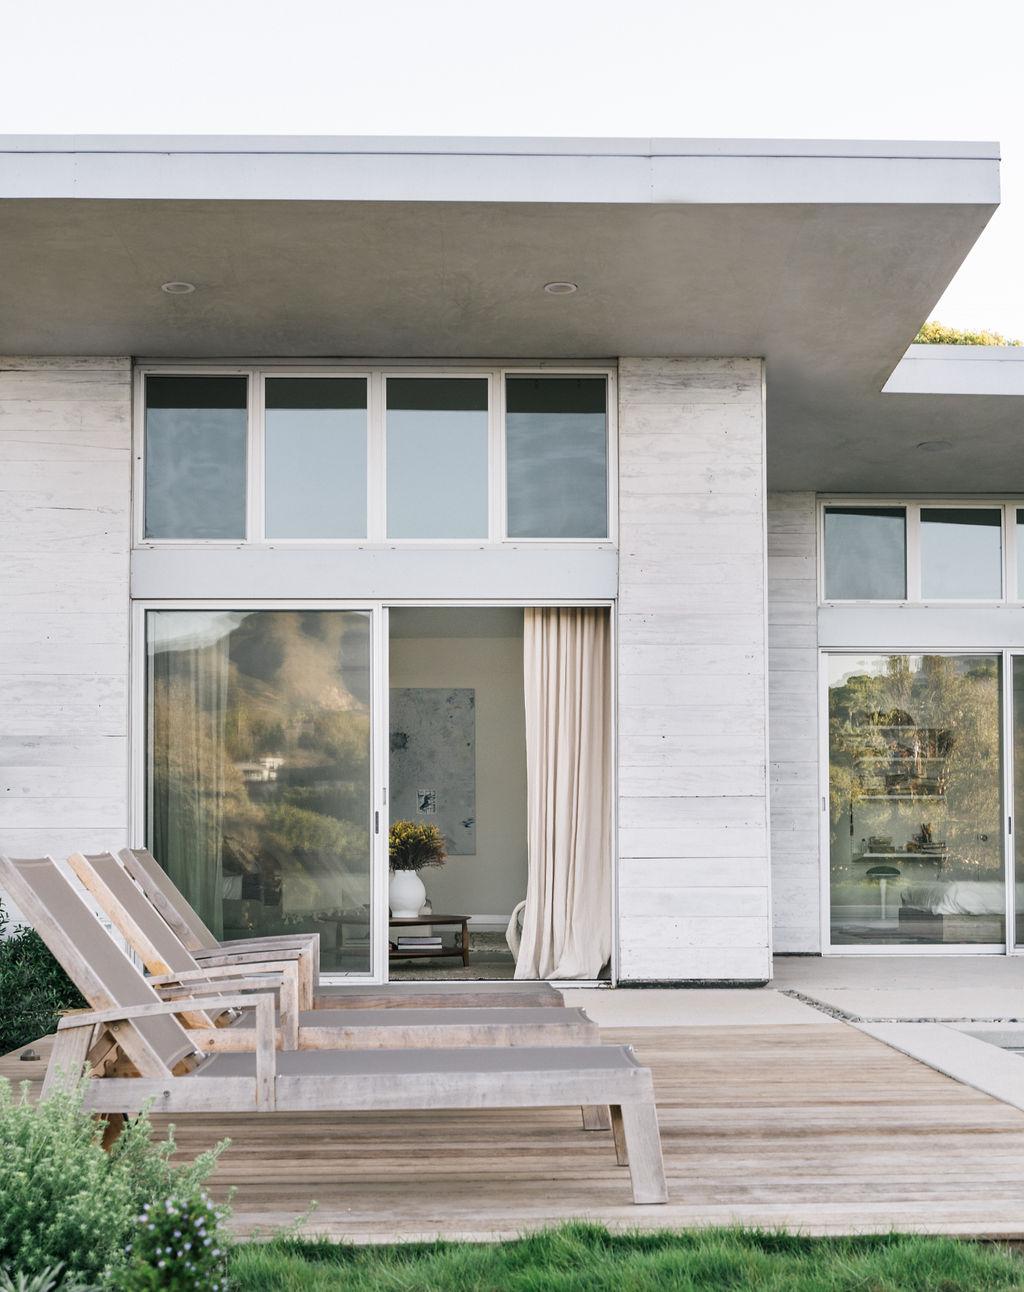 Malibu Modern Farmhouse by Burdge & Associates Architects in Malibu, California.  #home #architecture #house #homeinspo #homedesign